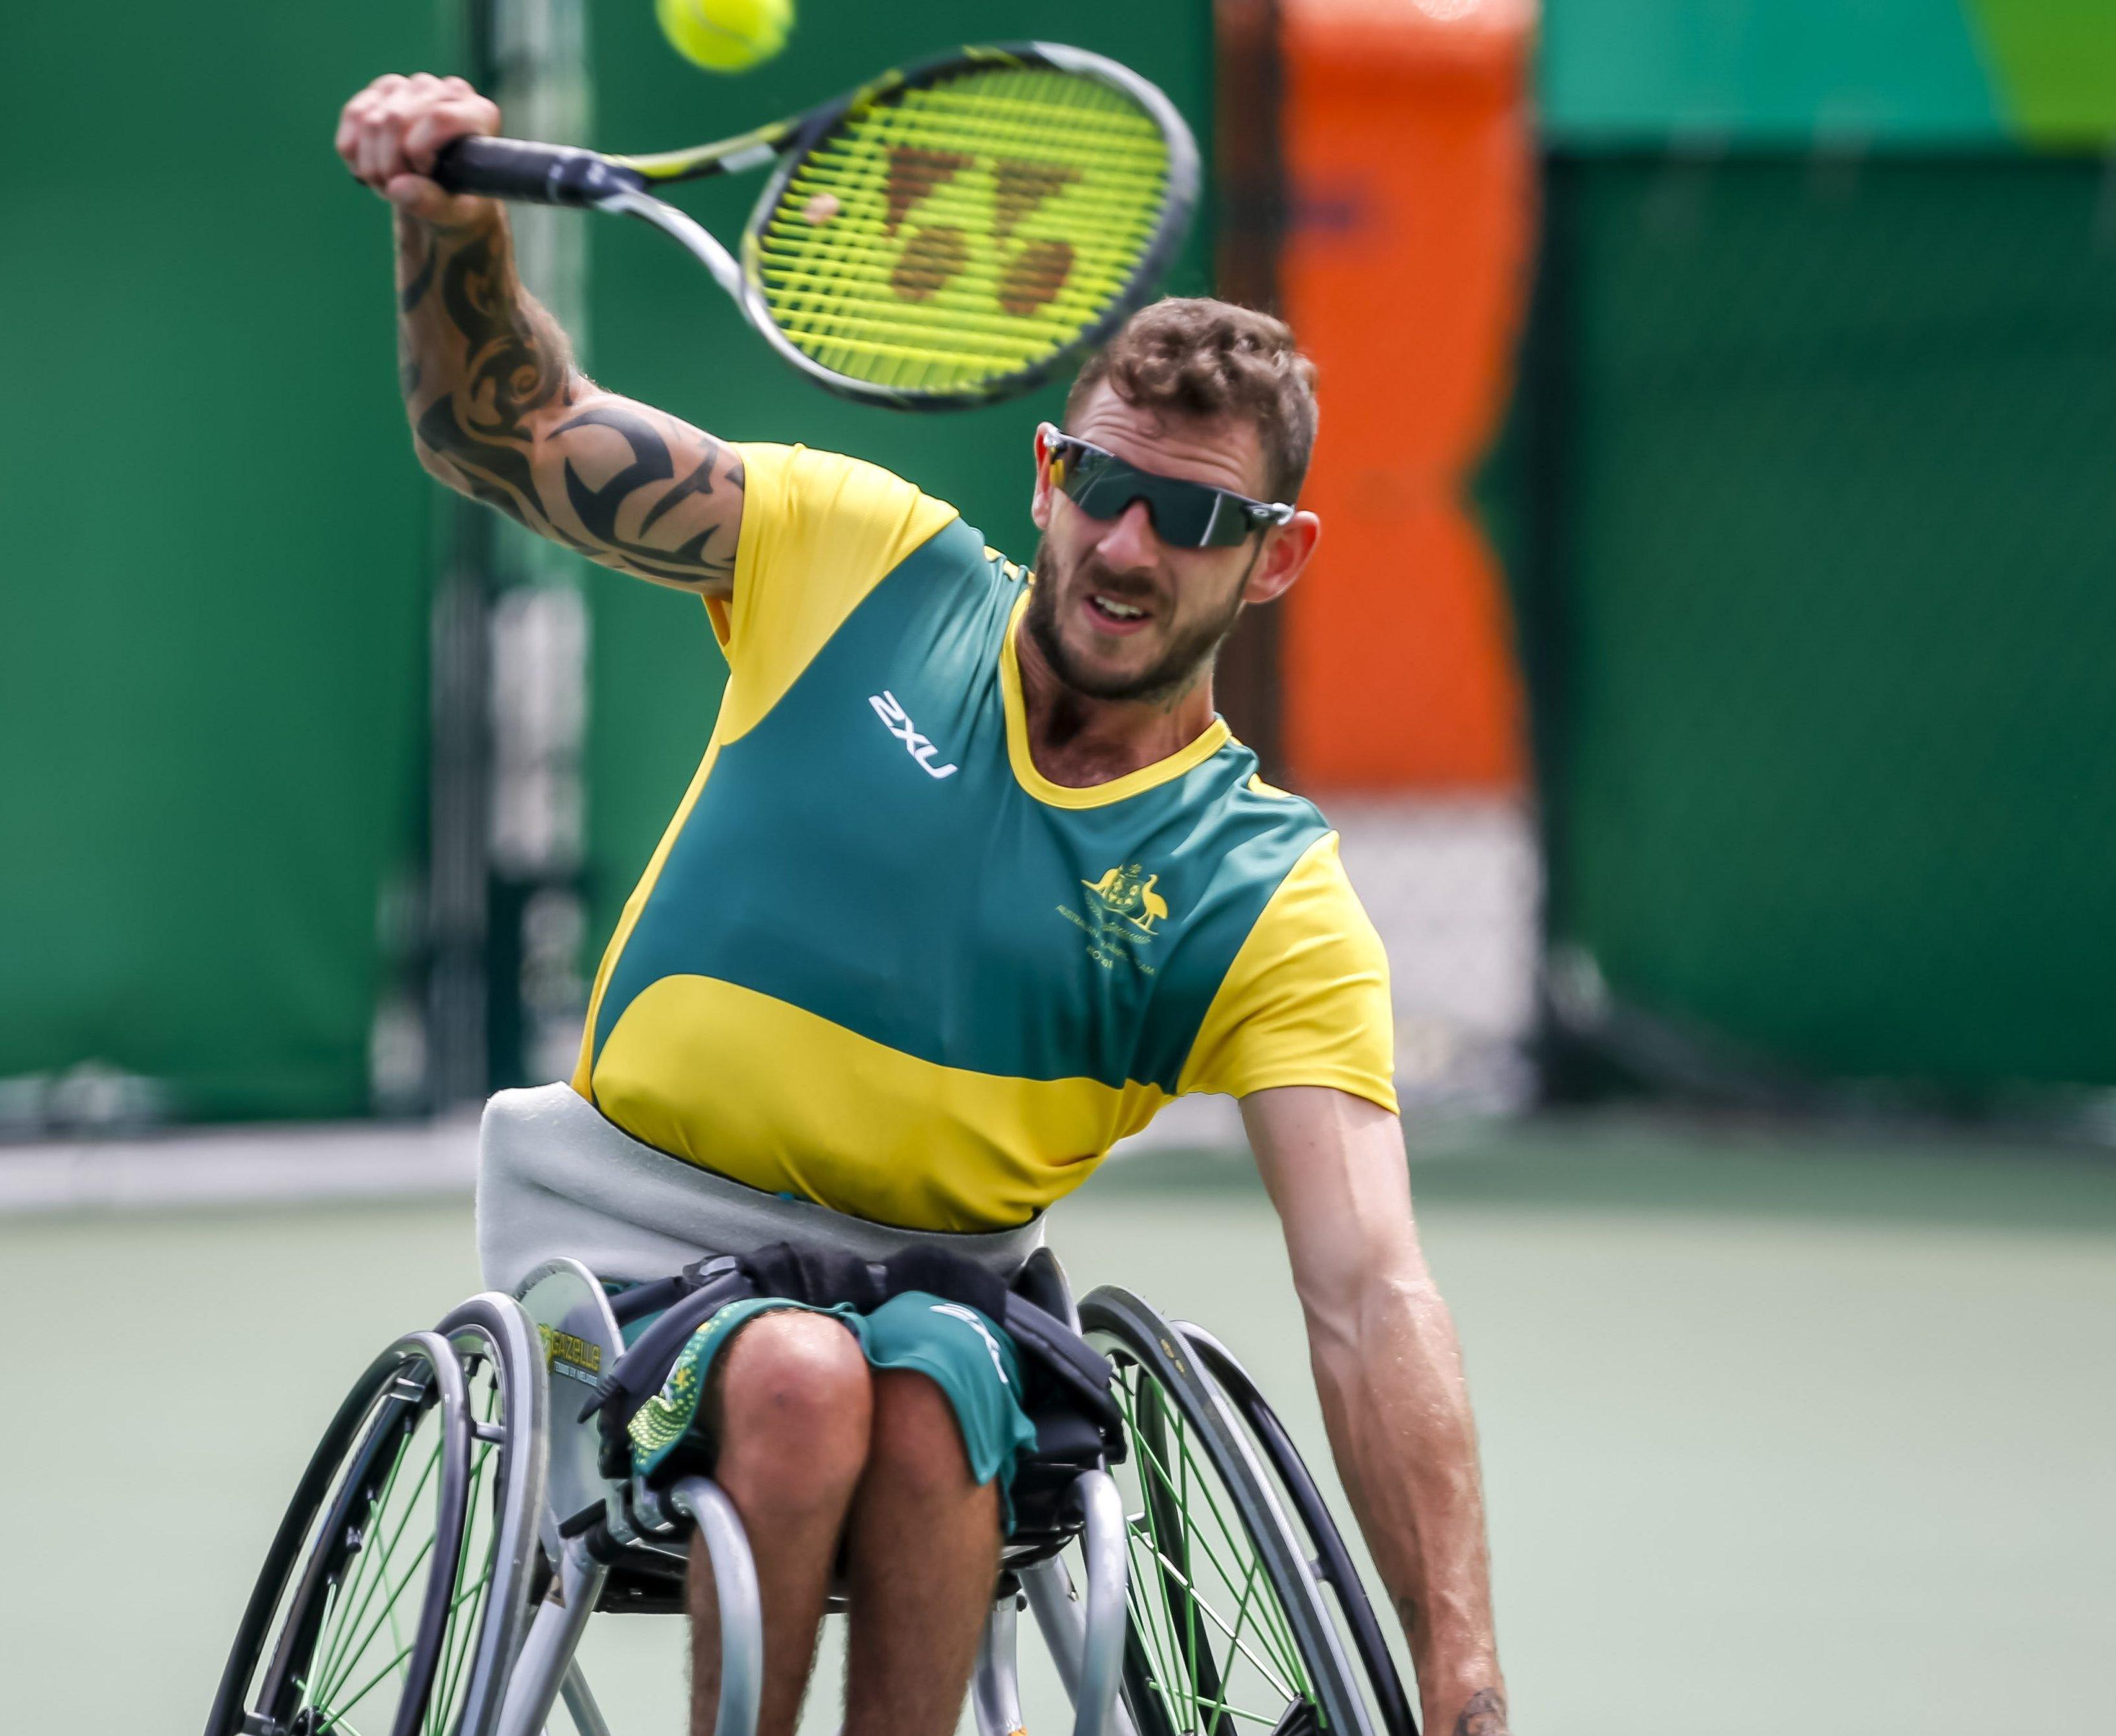 2017 Australian Open wheelchair tennis entries confirmed